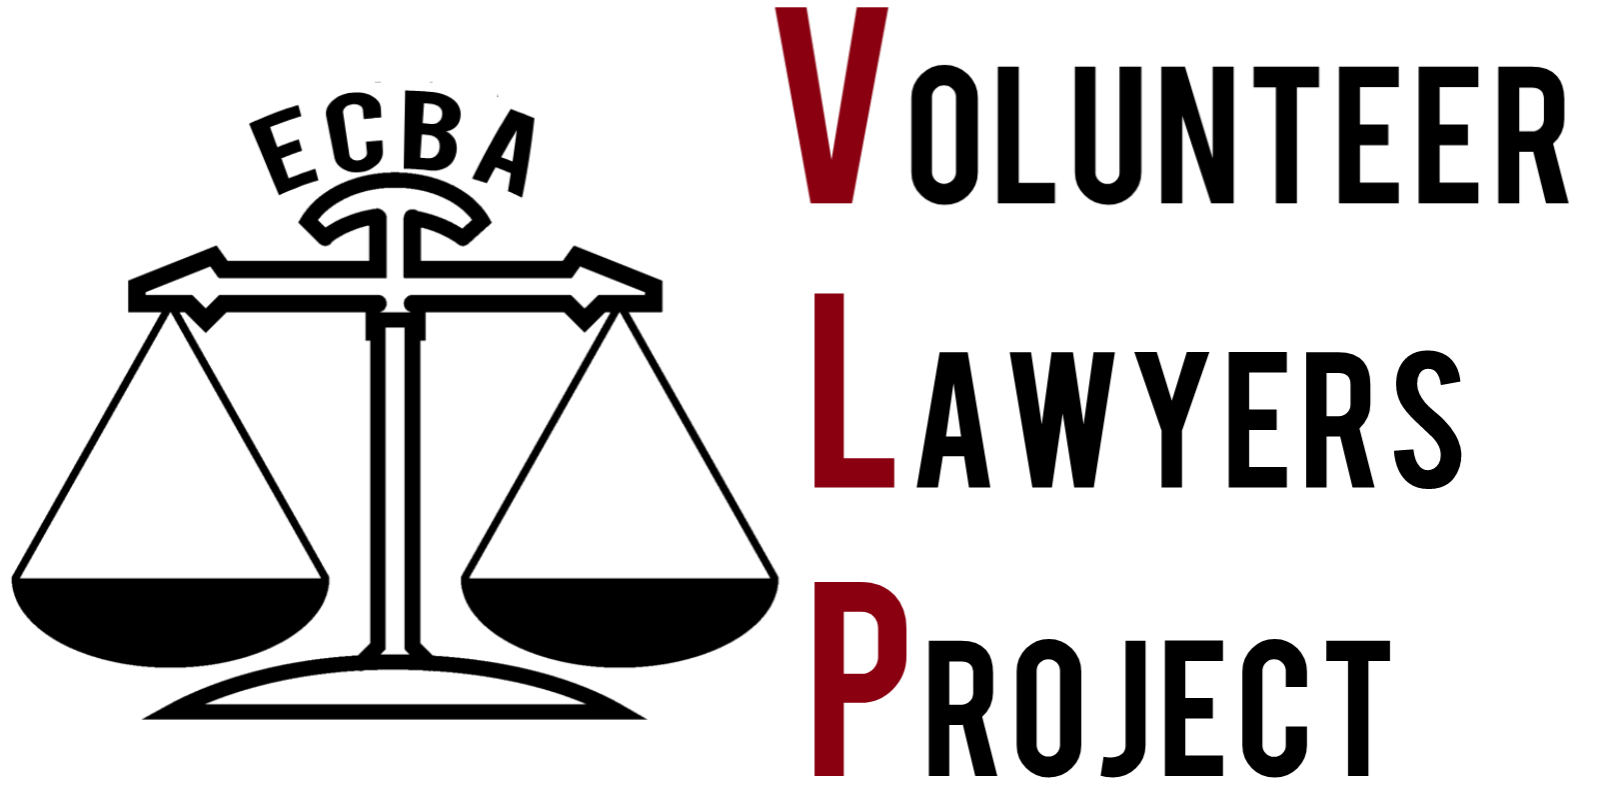 FCHD Volunteer Attorney Log-In | ECBA Volunteer Lawyers Project